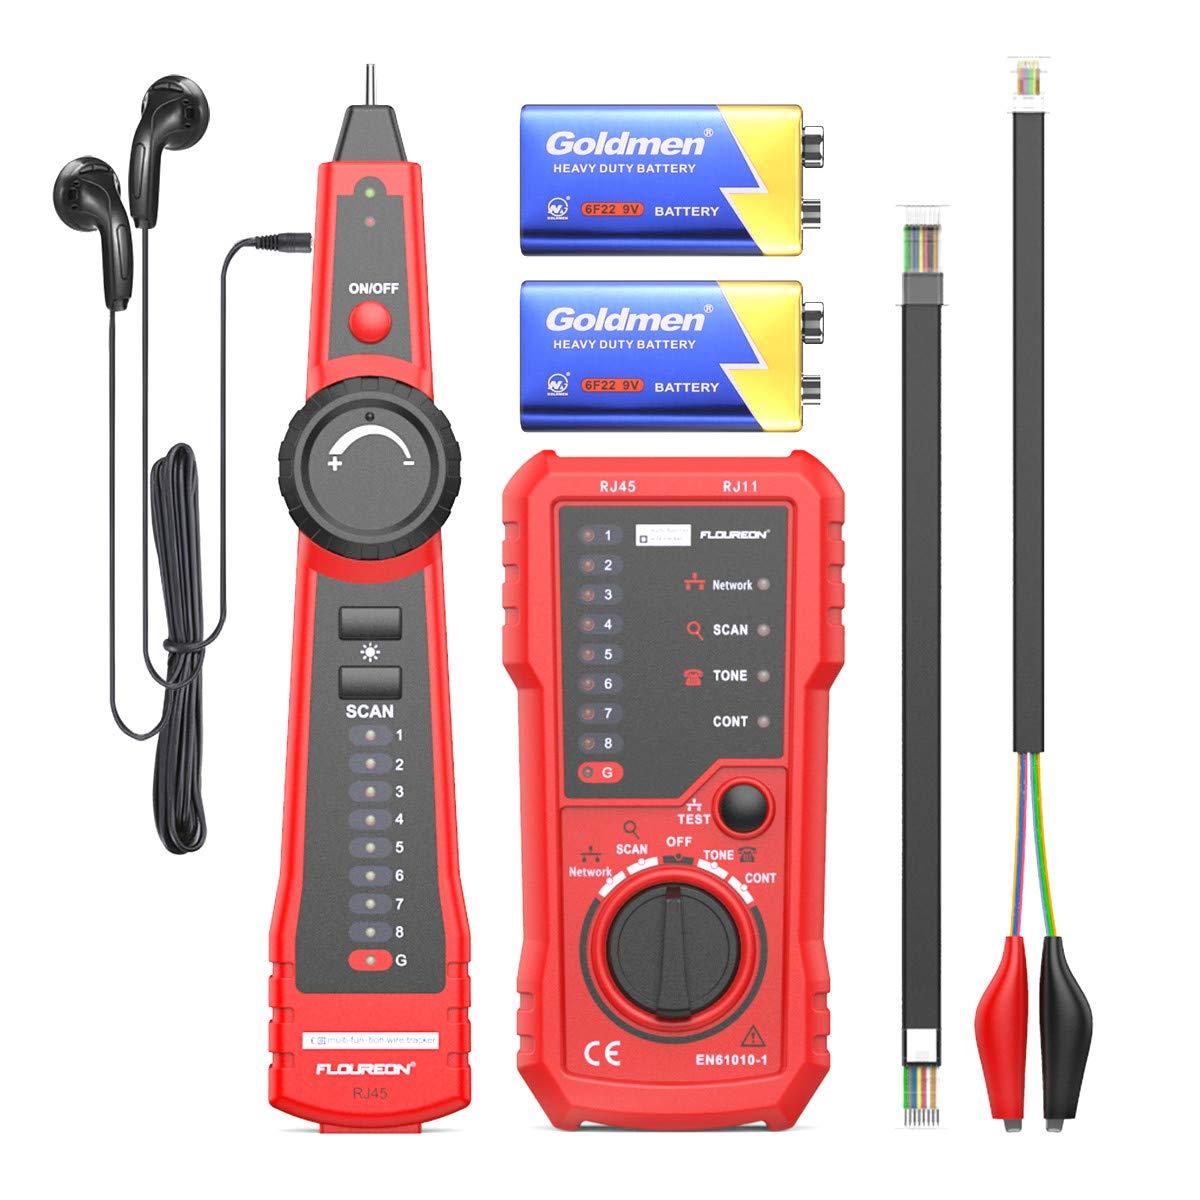 RJ11 RJ45 Cat5 Cat6 Telephone Wire Tracker Tracer Toner Ethernet LAN Network Cable Tester Detector Line Finder Tool